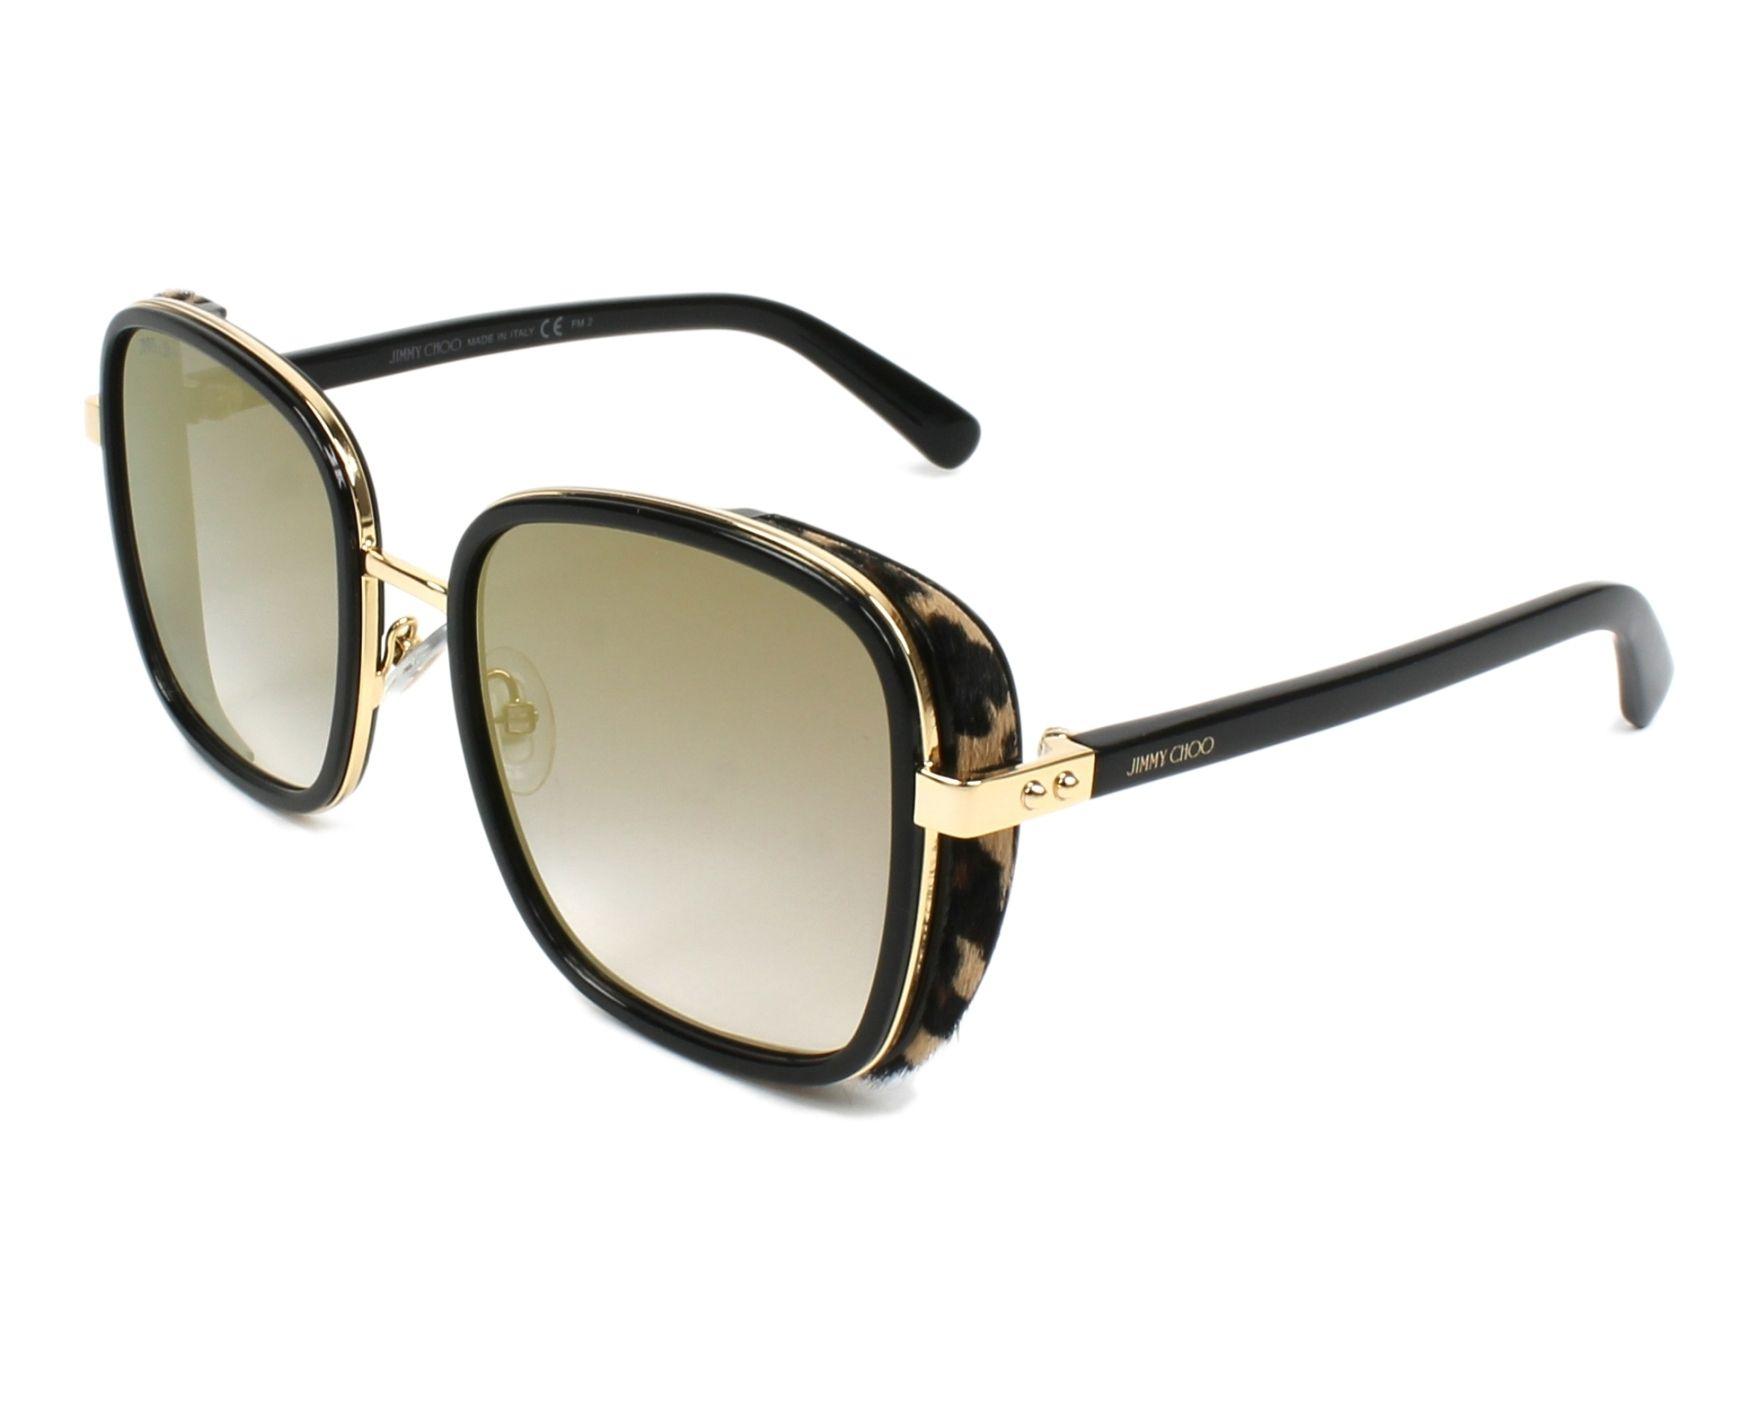 aa29fb51a9bc thumbnail Sunglasses Jimmy Choo ELVA-S FP3 FQ - Black Leo profile view